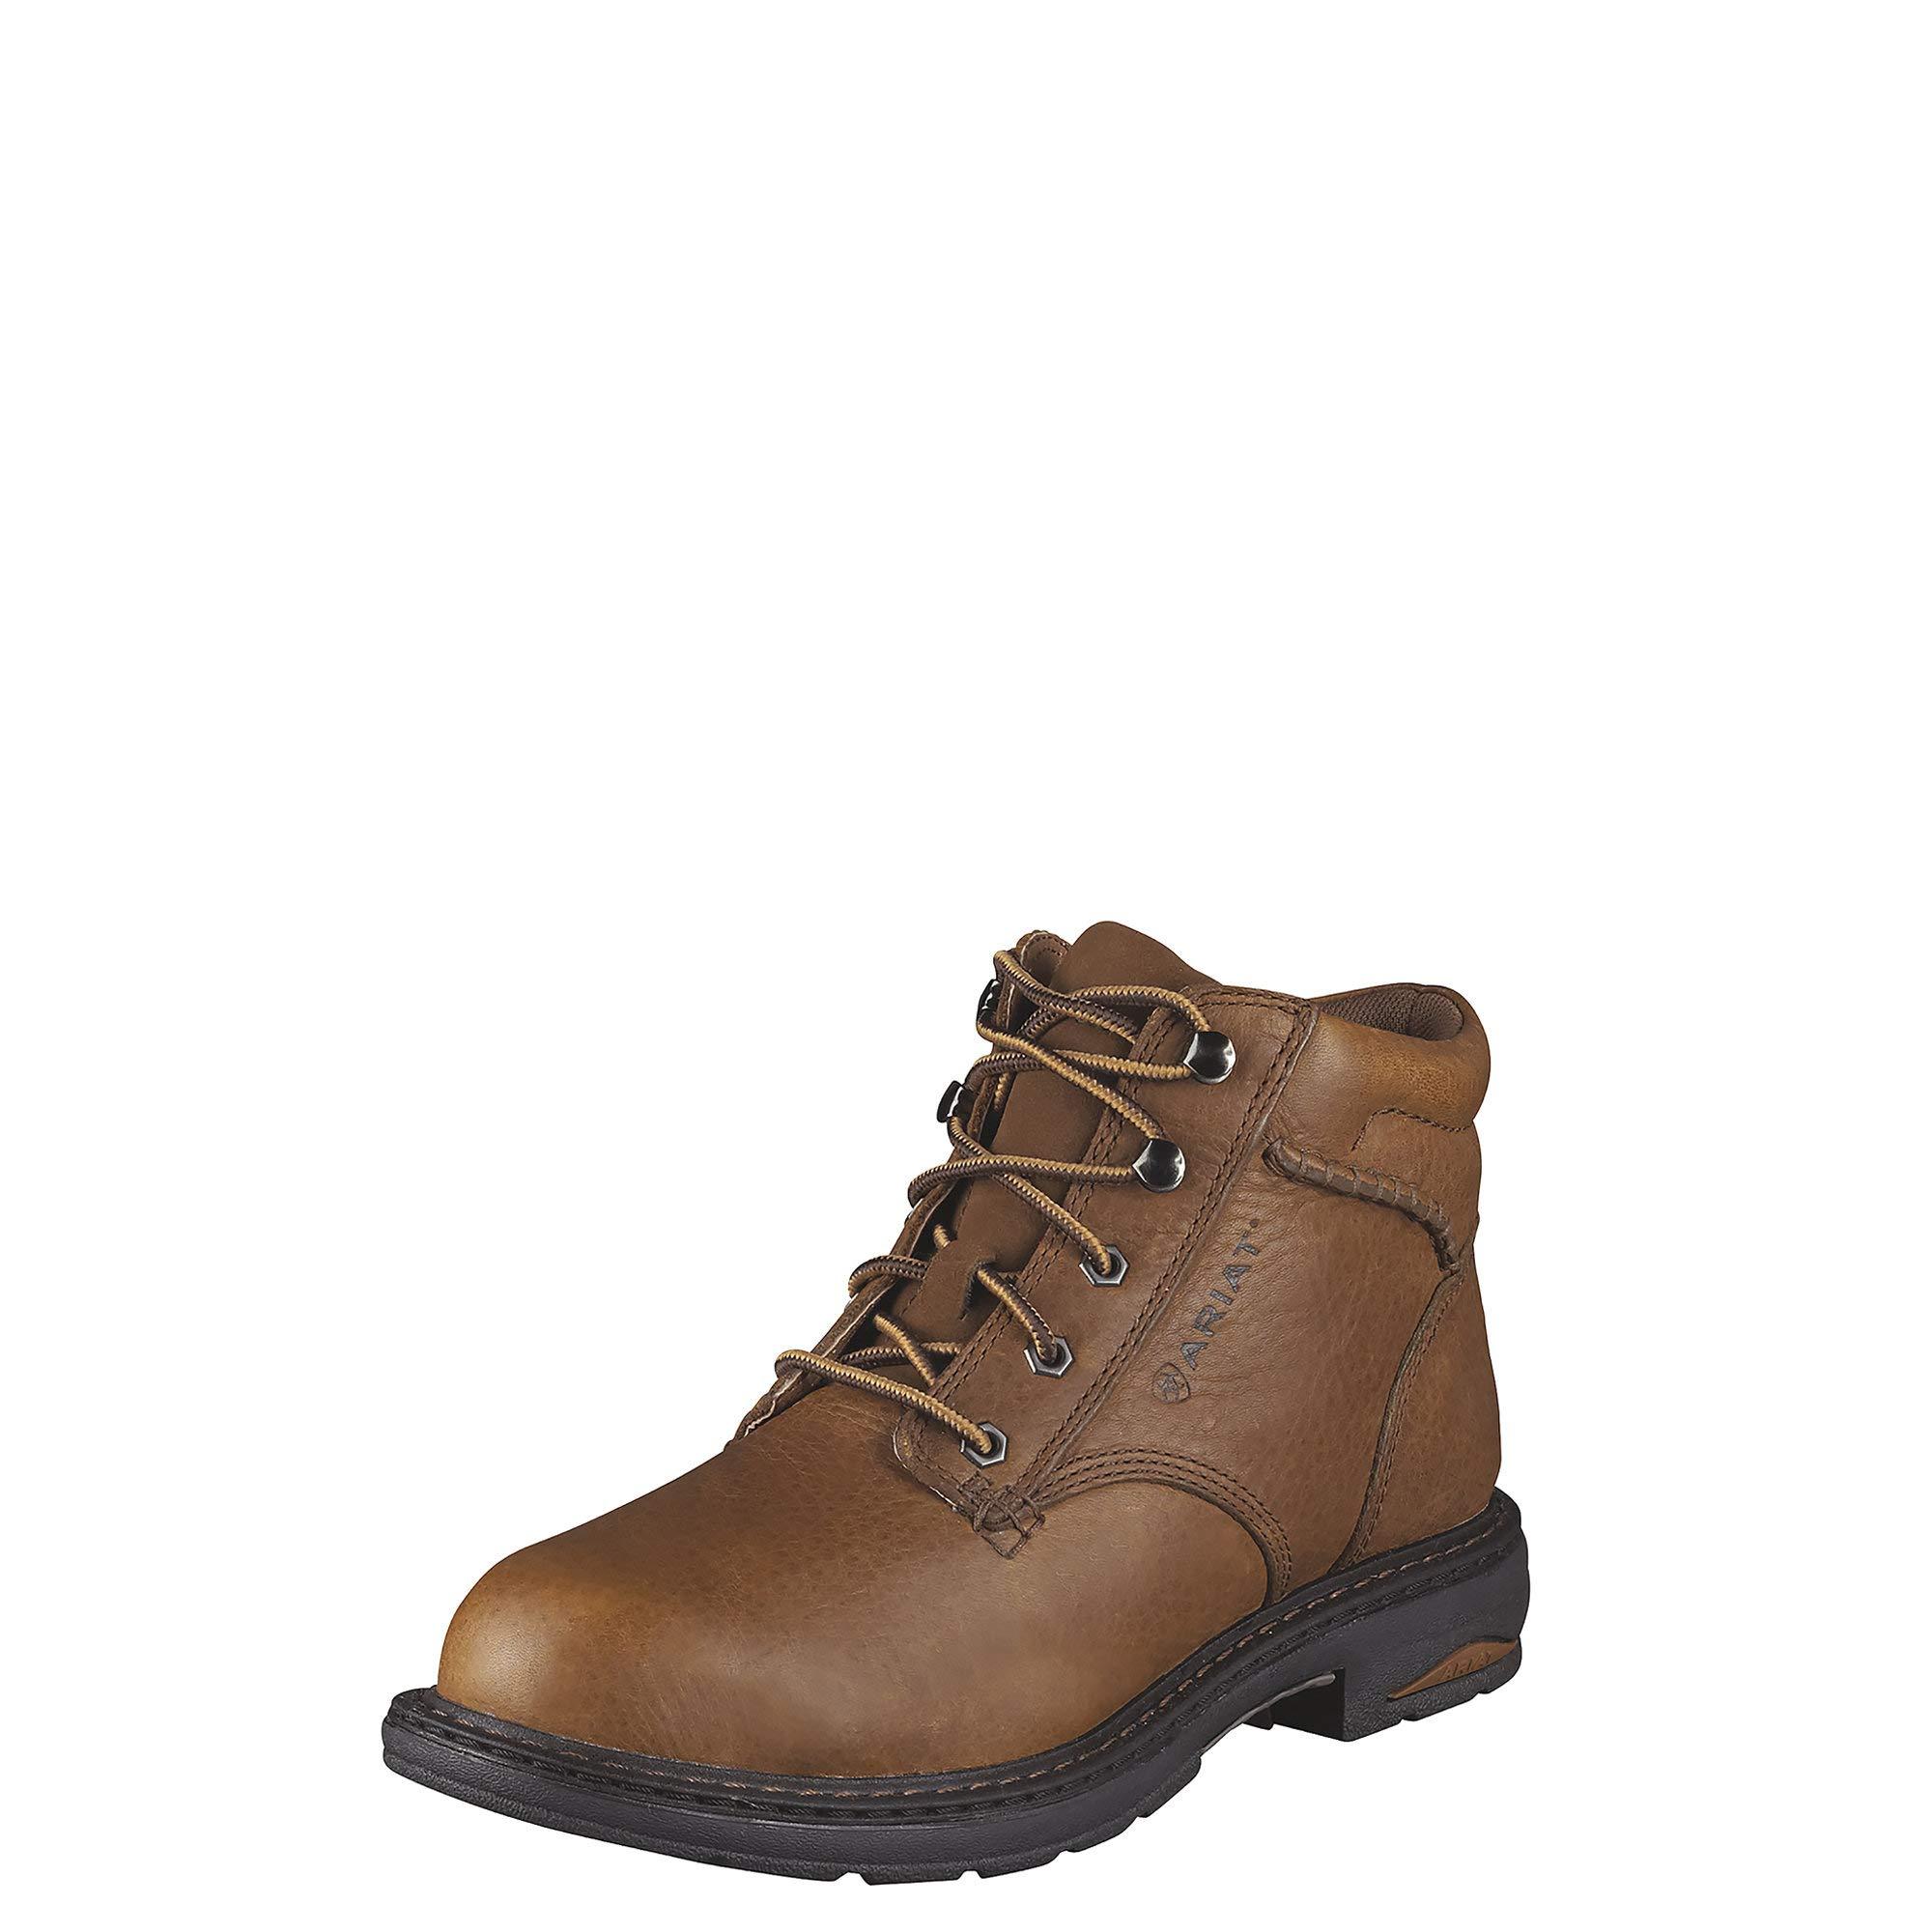 ARIAT Women's Macey Composite Toe Work Boot Dark Peanut Size 10.5 B/Medium Us